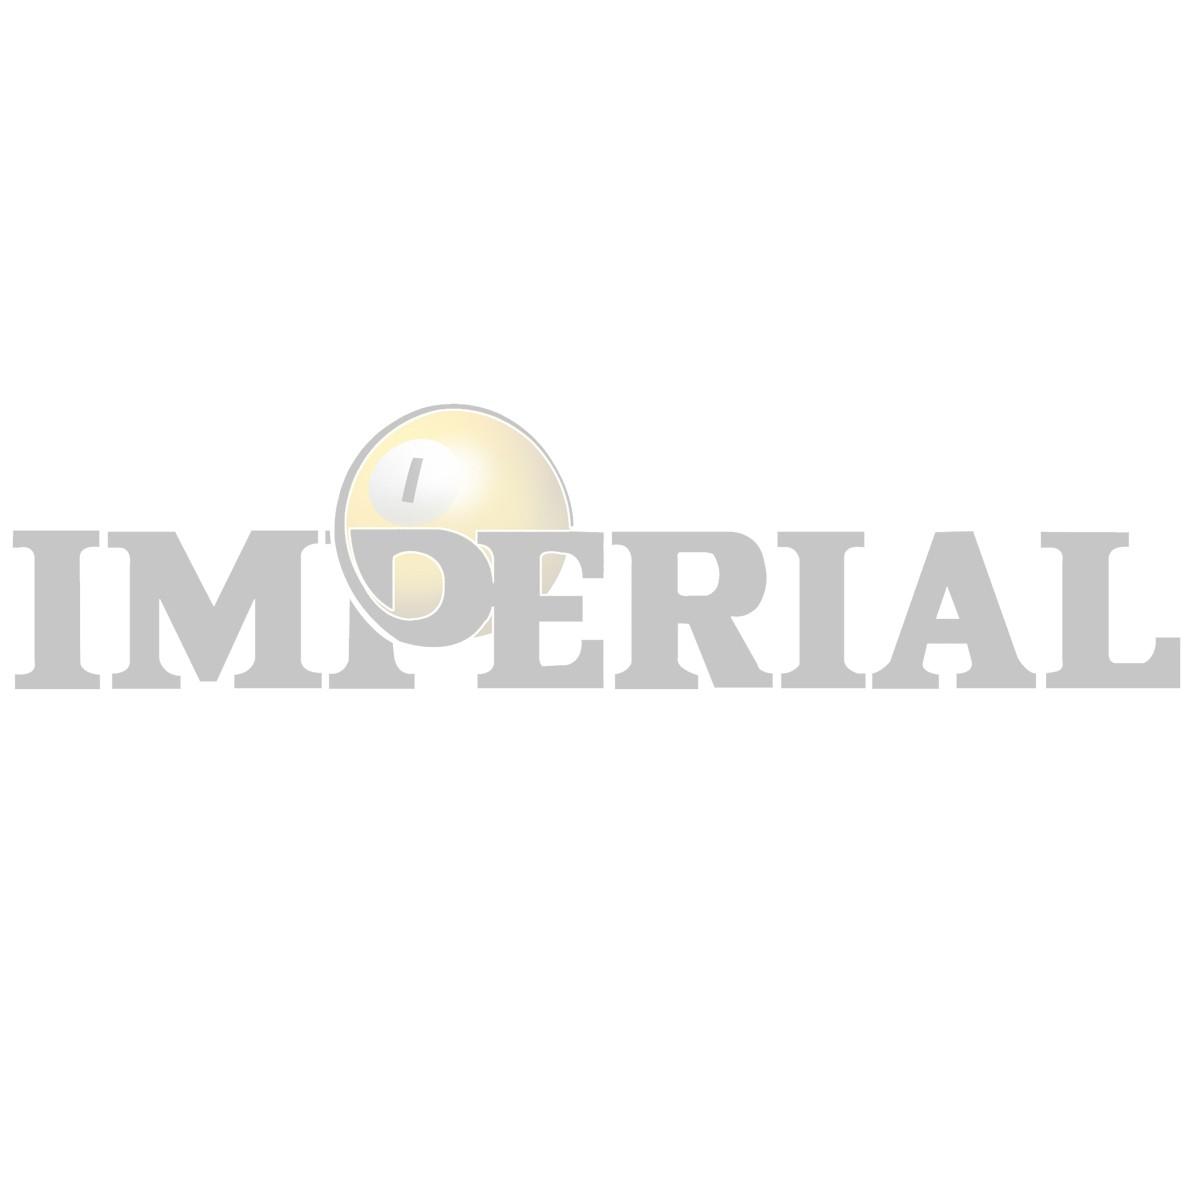 Pittsburgh Steelers 8-foot Billiard Cloth